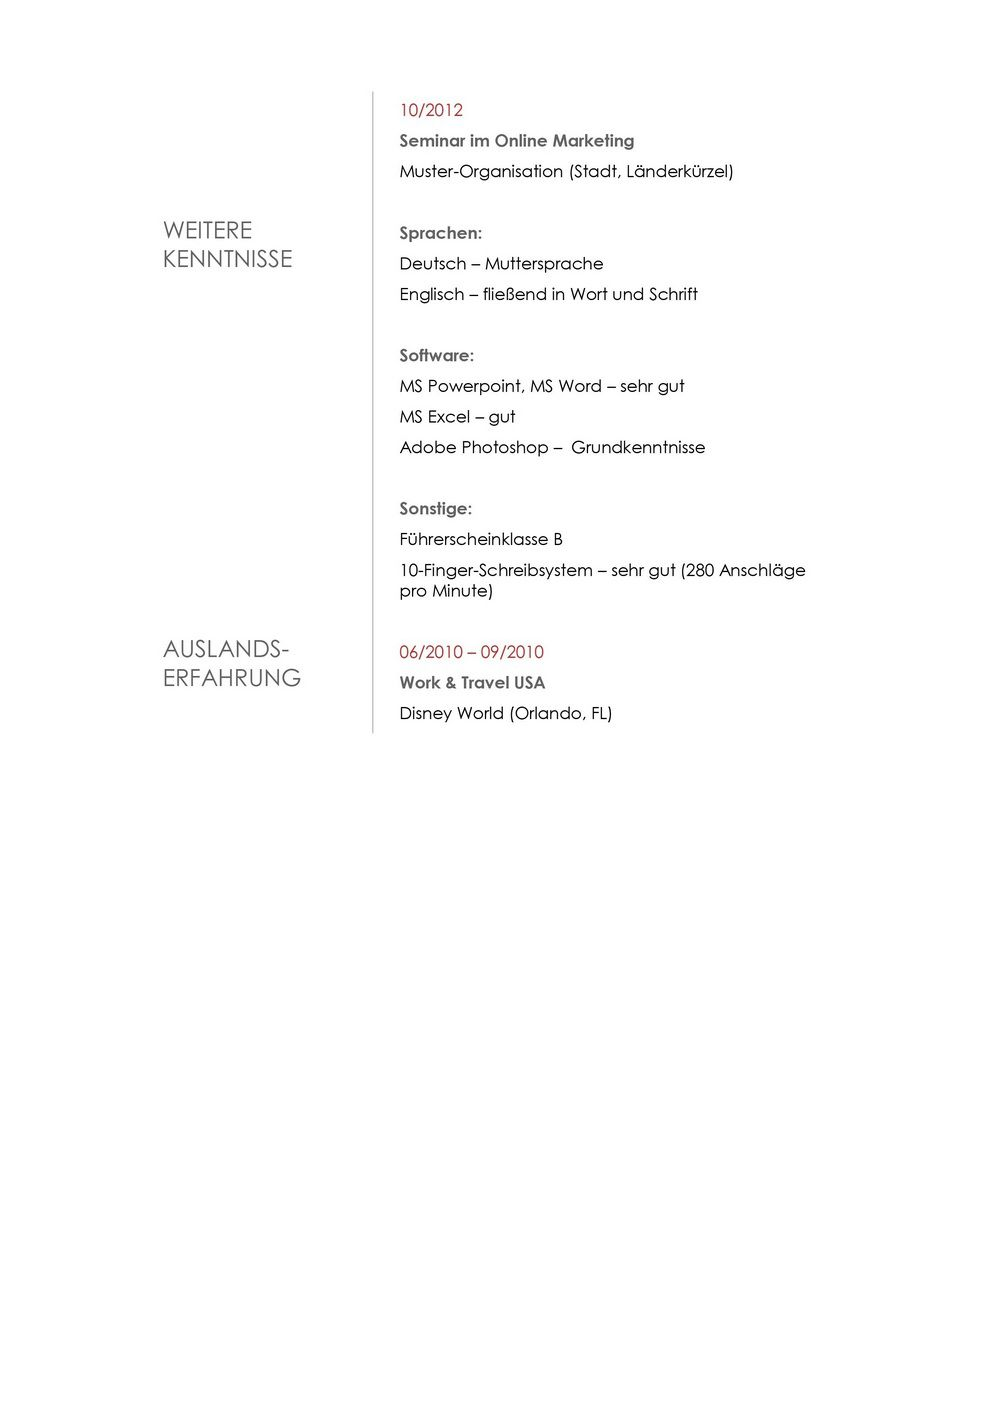 Lebenslauf Muster 12 | lebenslaufdesigns.de